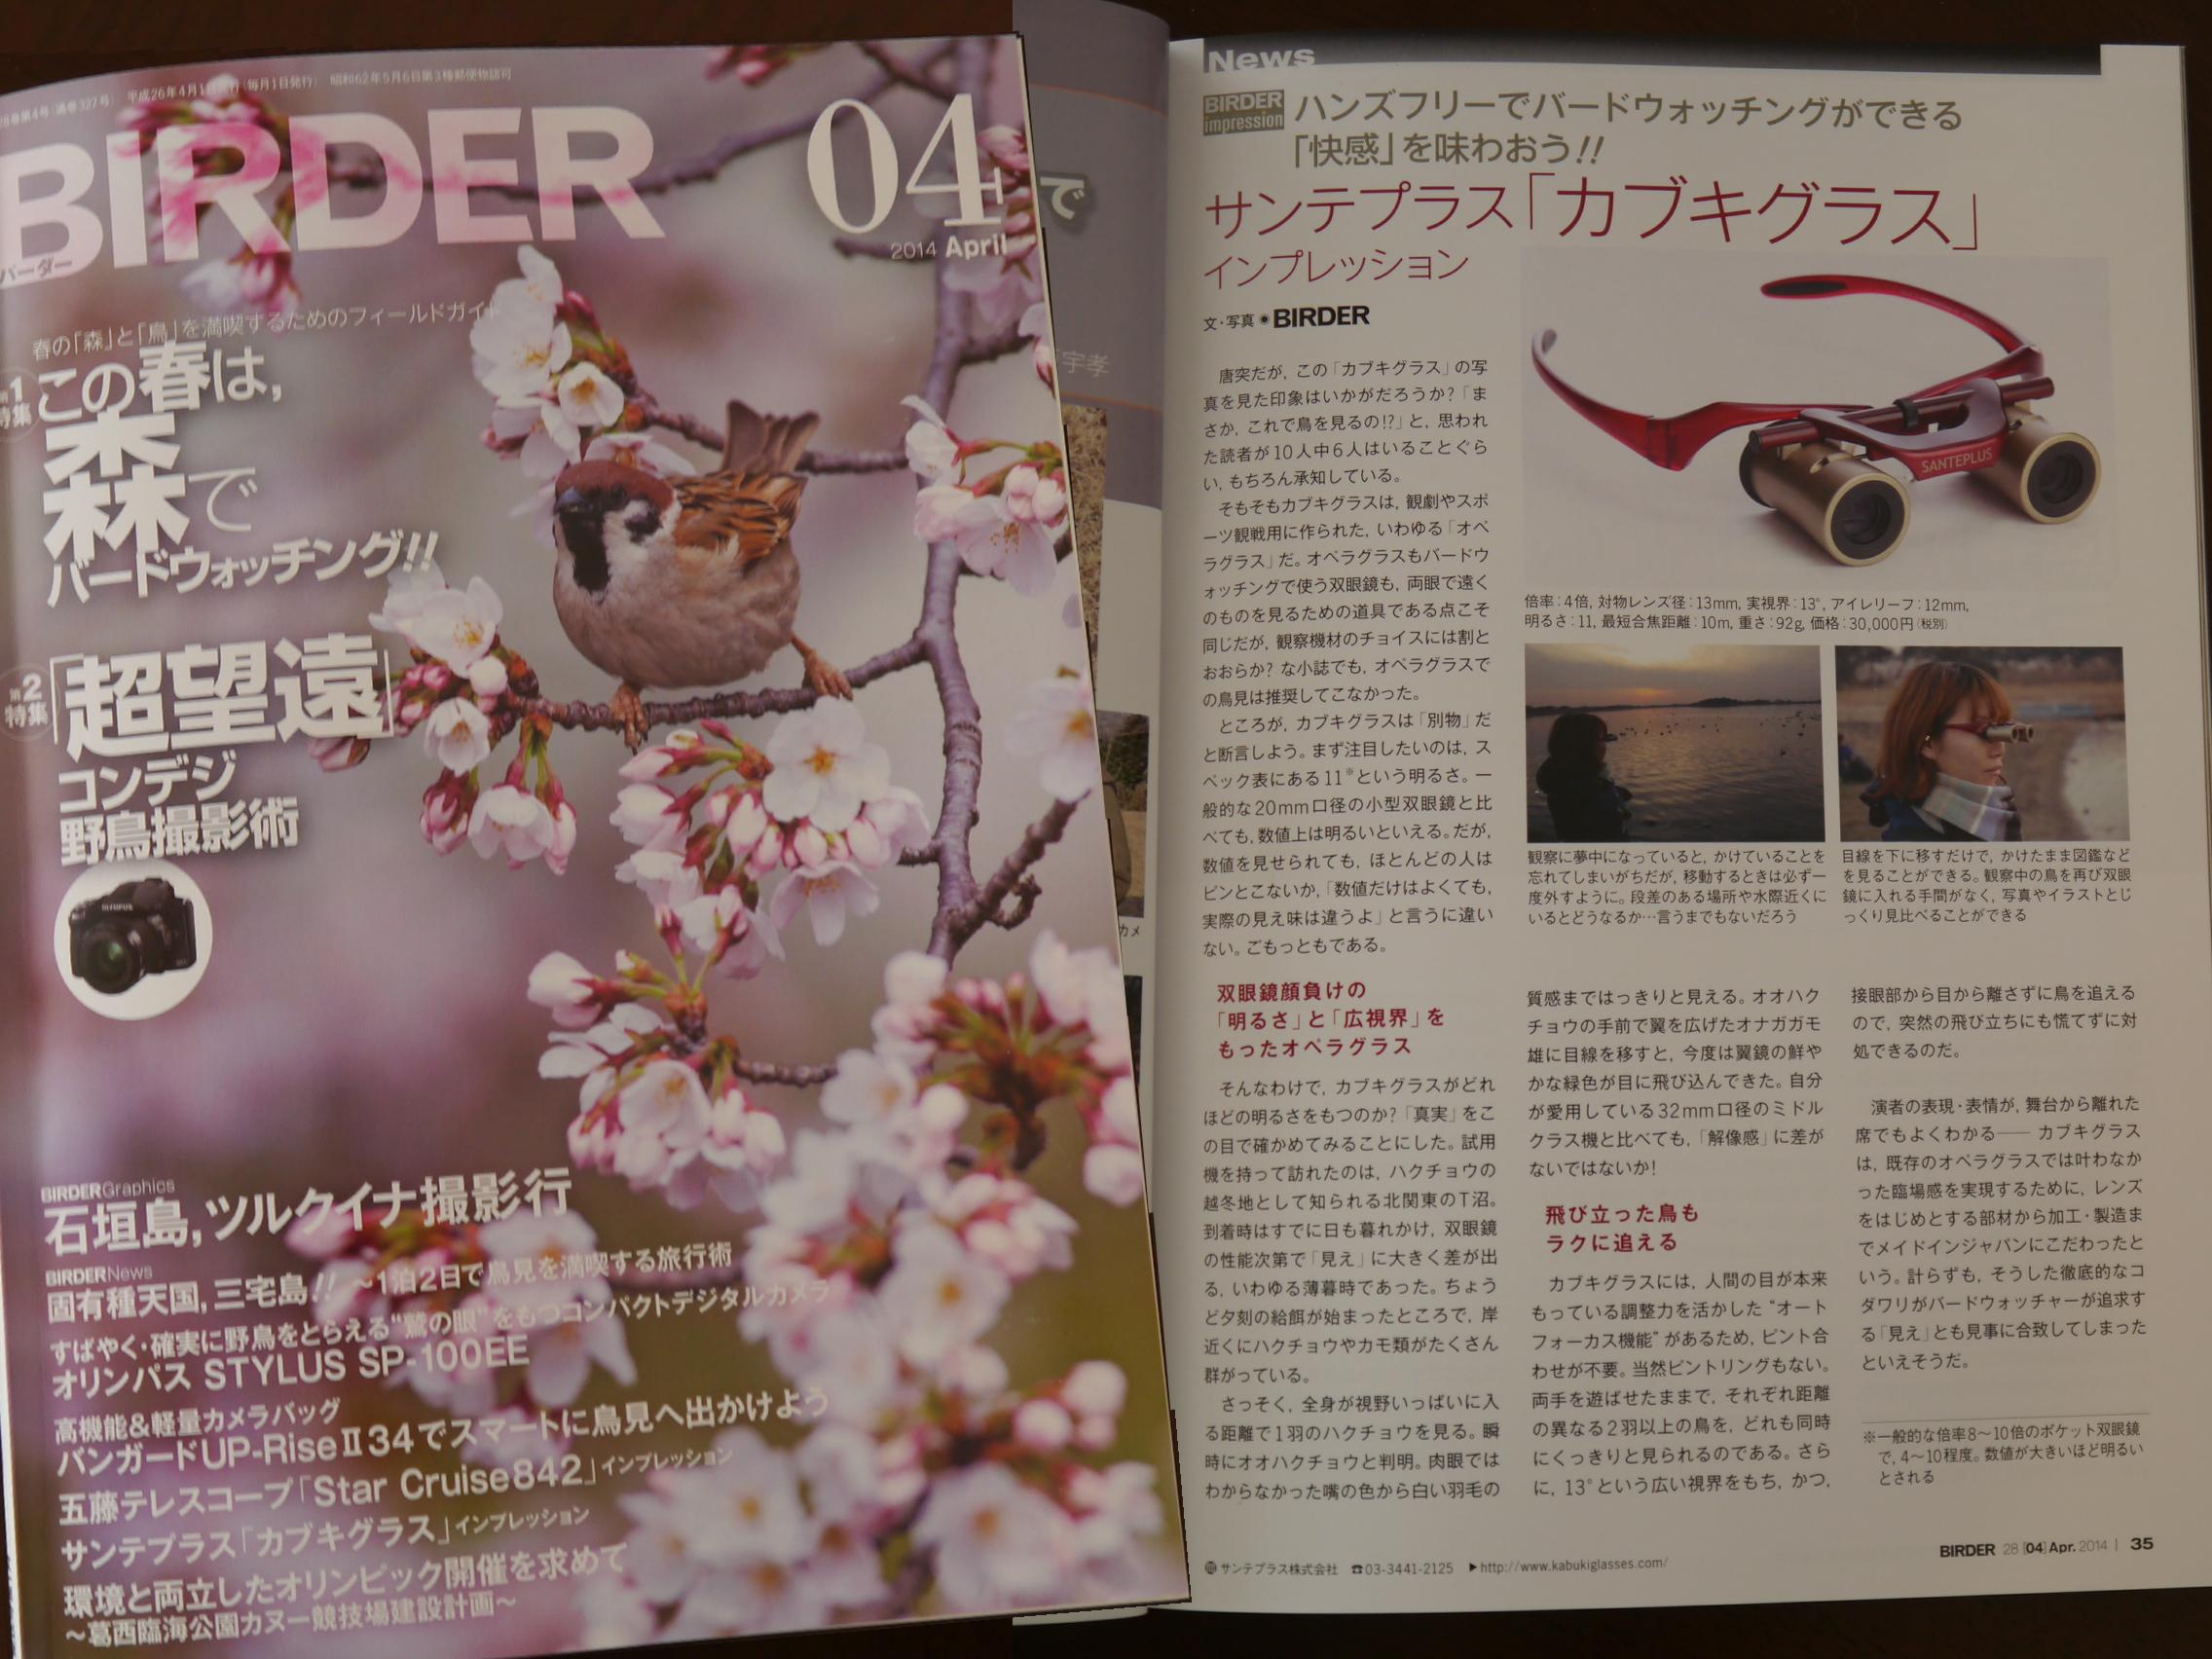 Birder201404.jpg